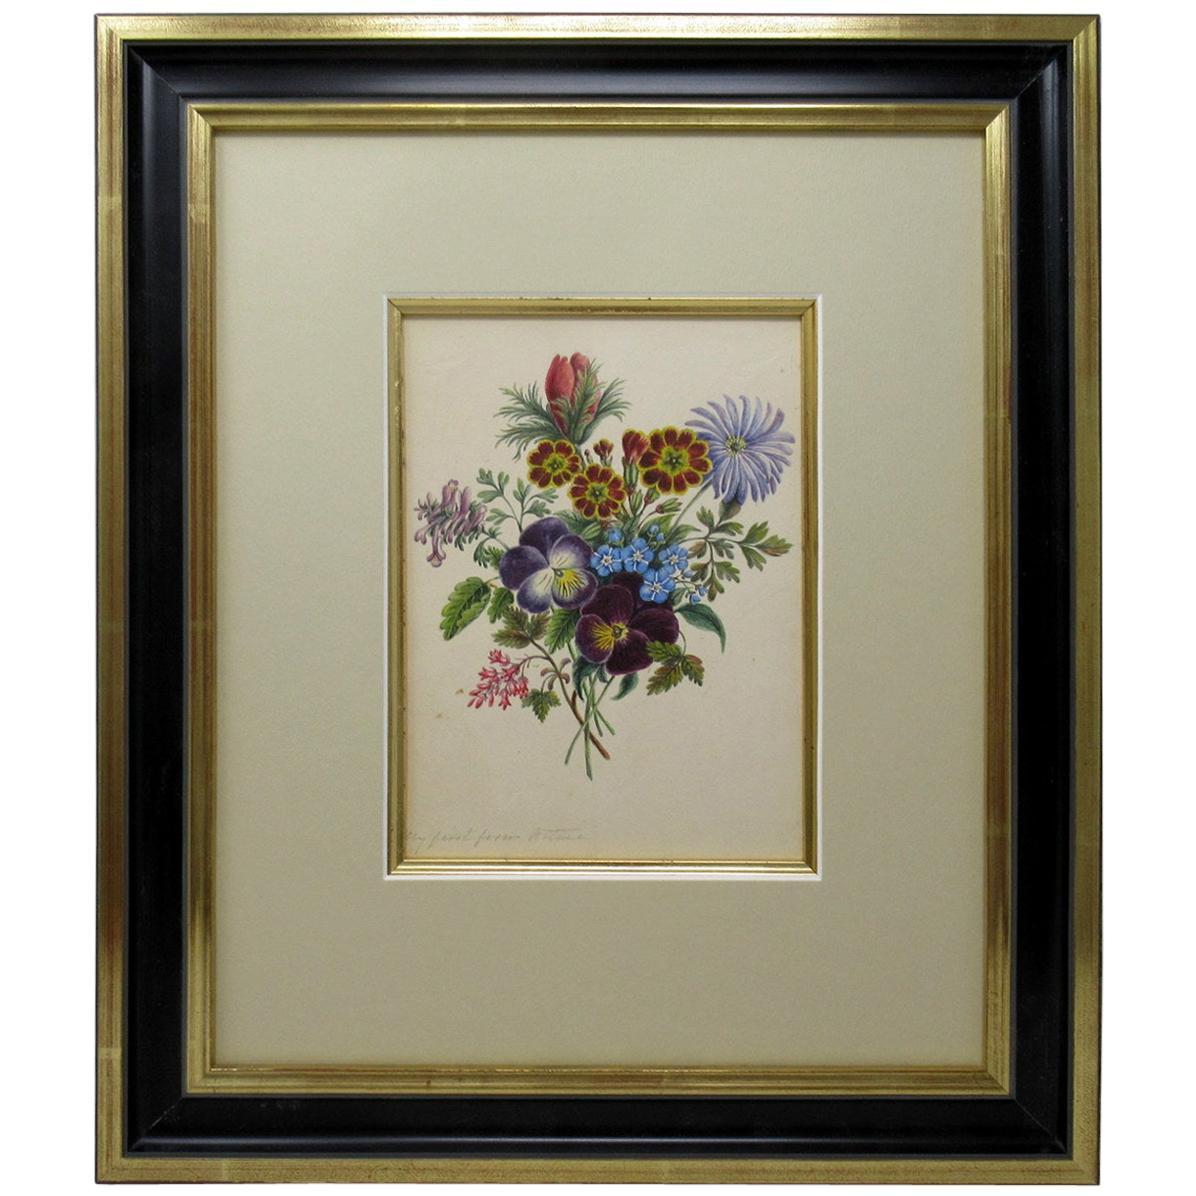 Antique English Watercolor Painting Still Life of Flowers Gilt Ebony, circa 1900